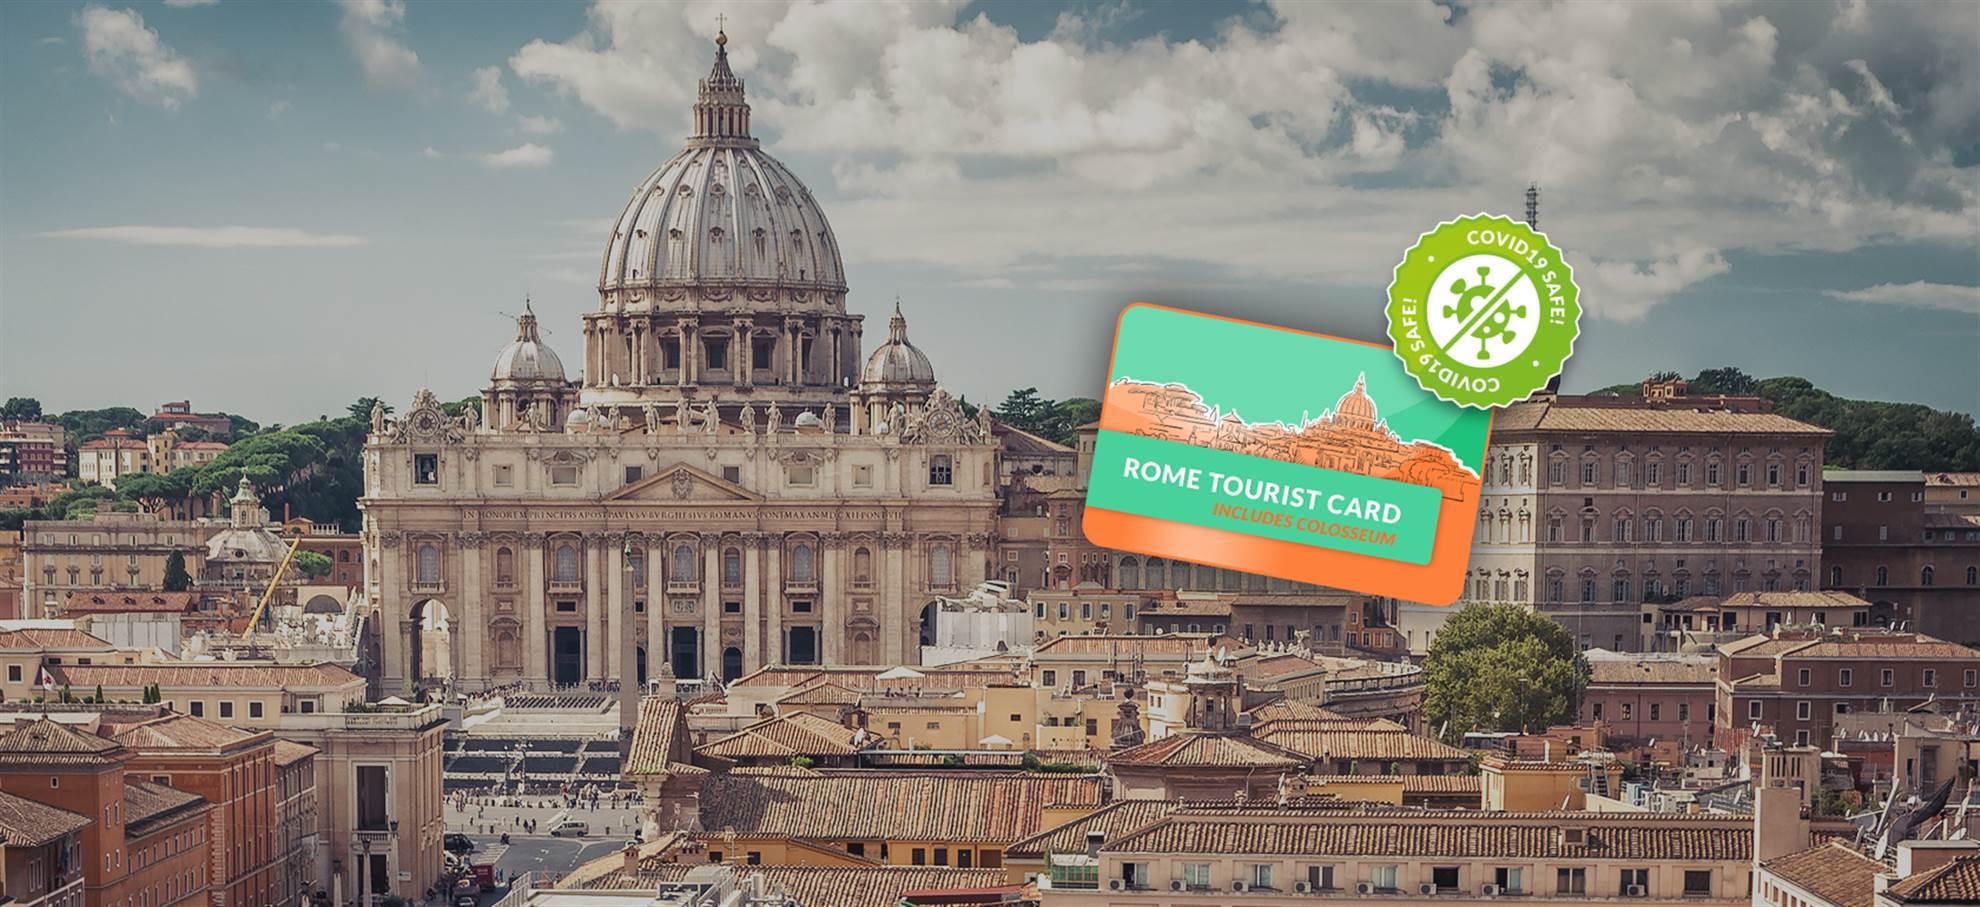 Rom Tourist Card